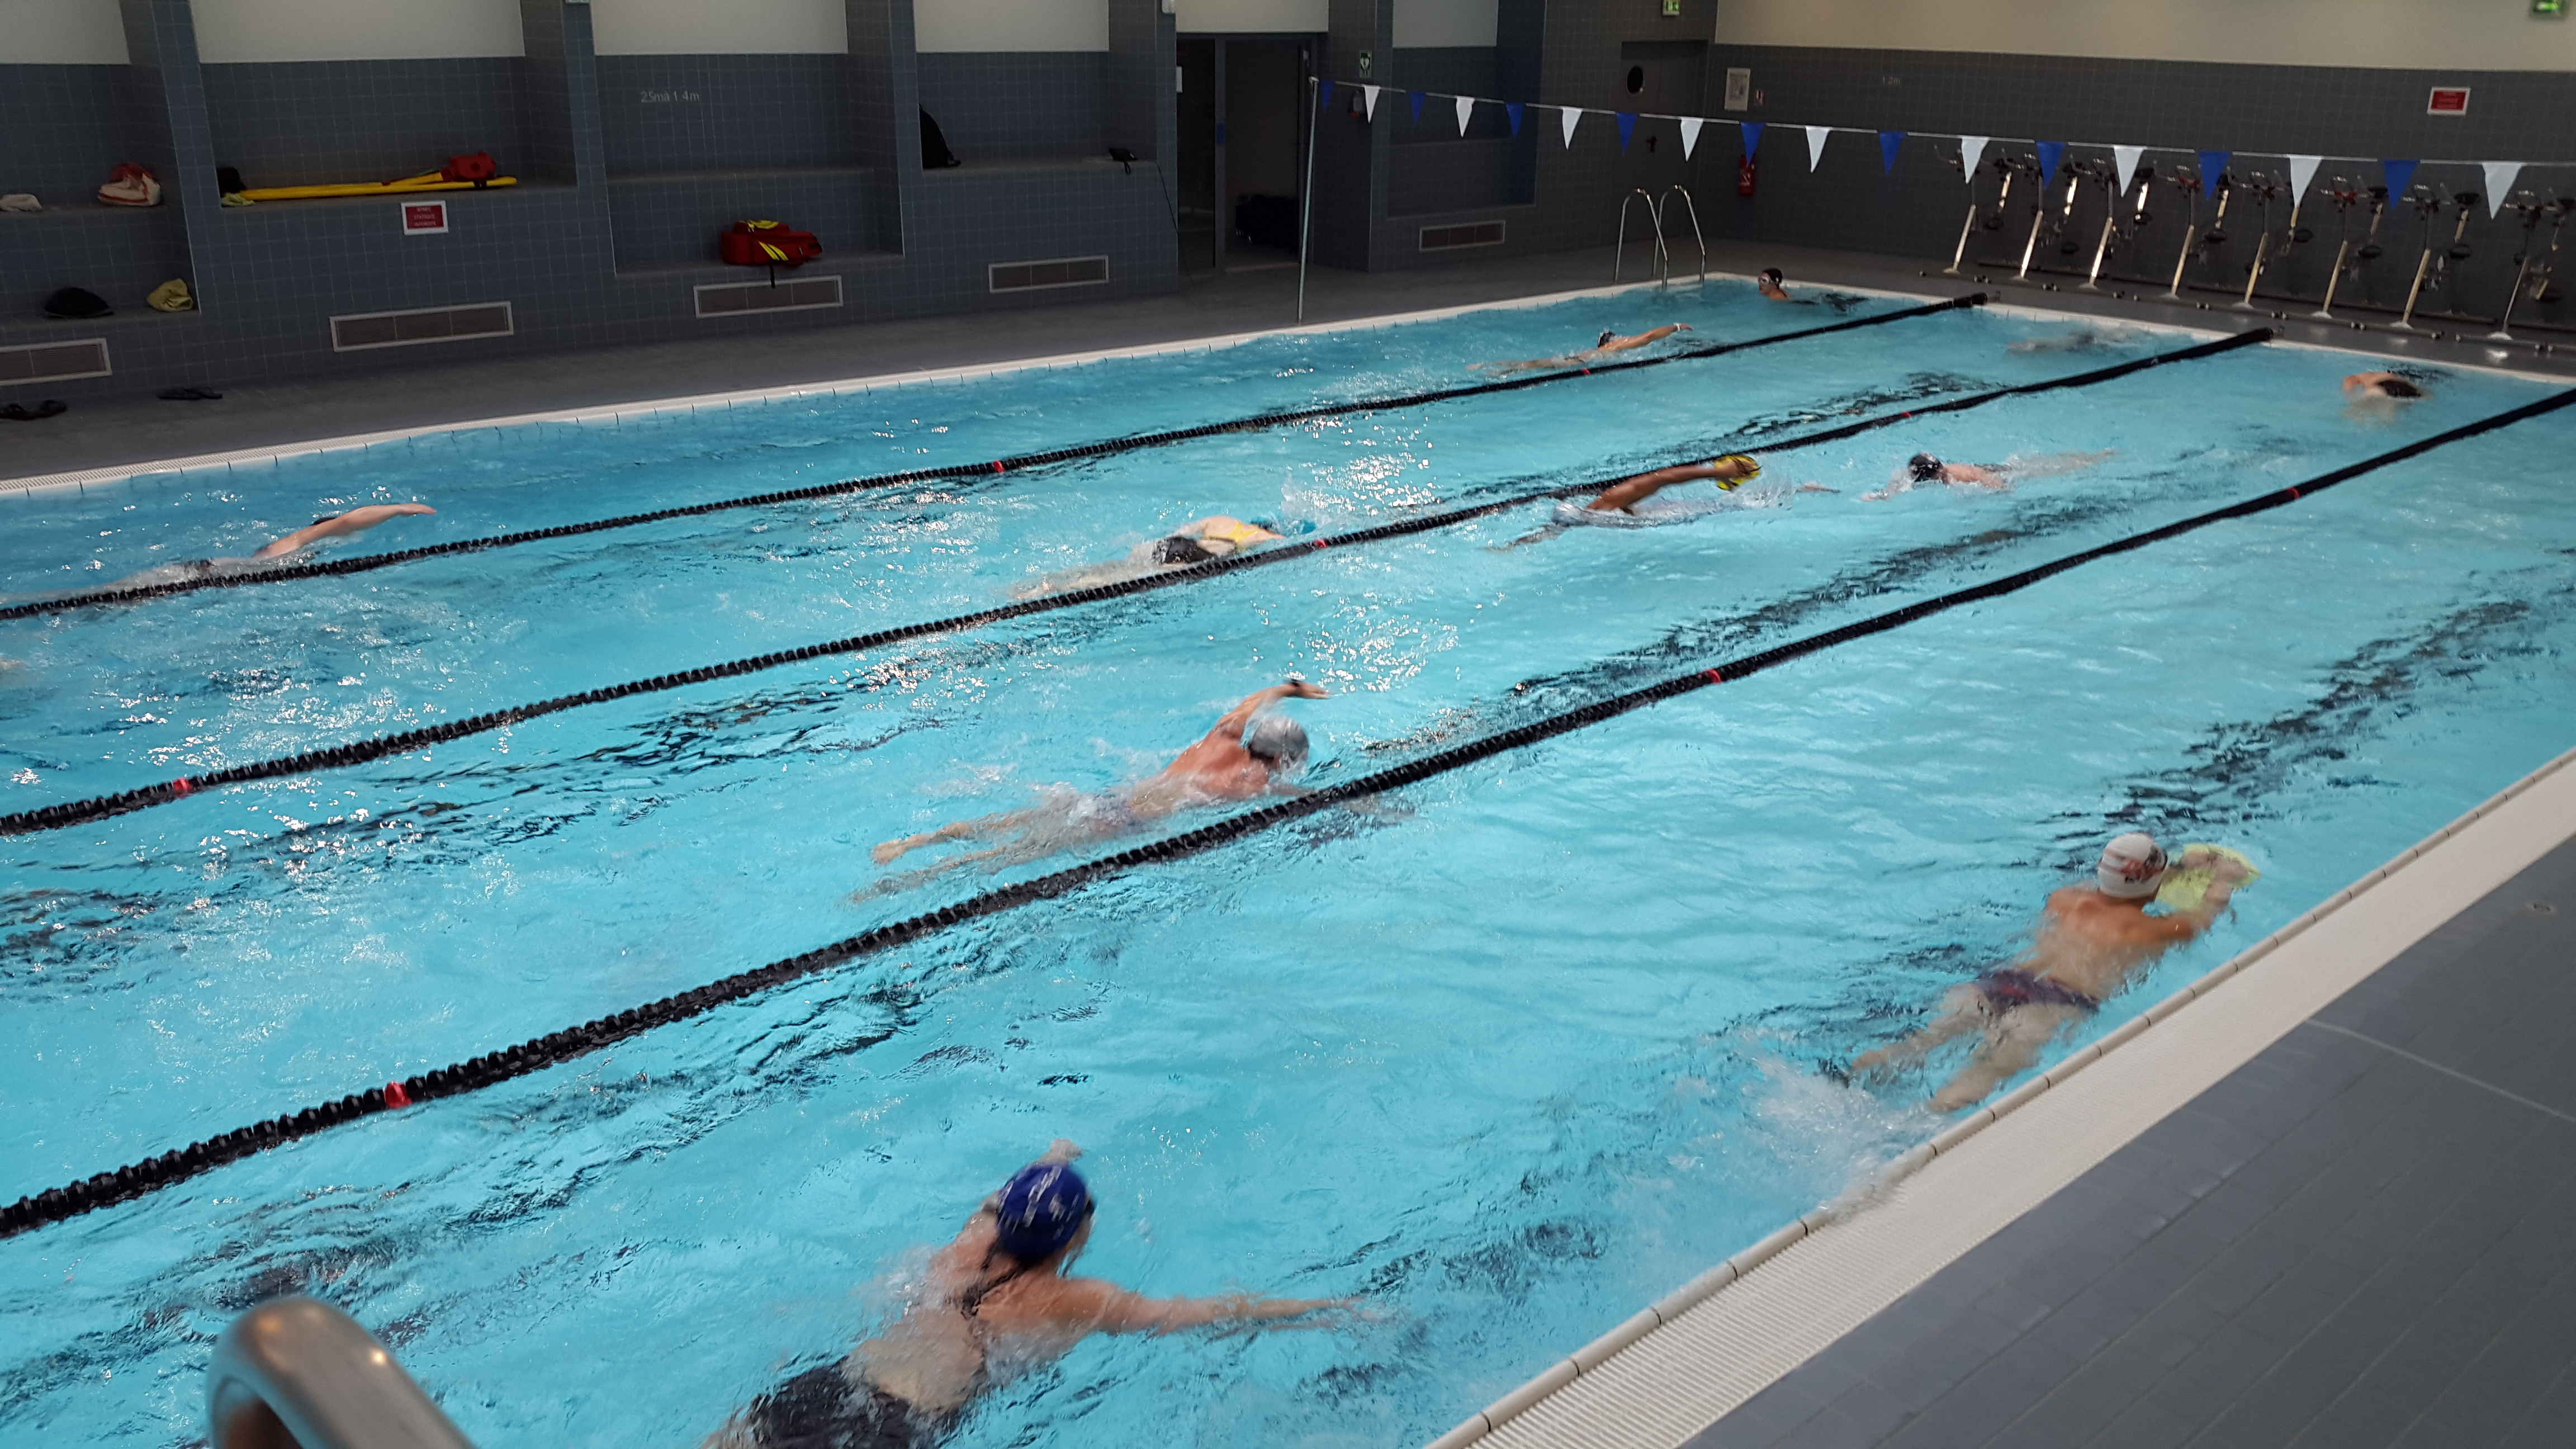 Club d fense balard arcueil natation for Piscine keller horaires